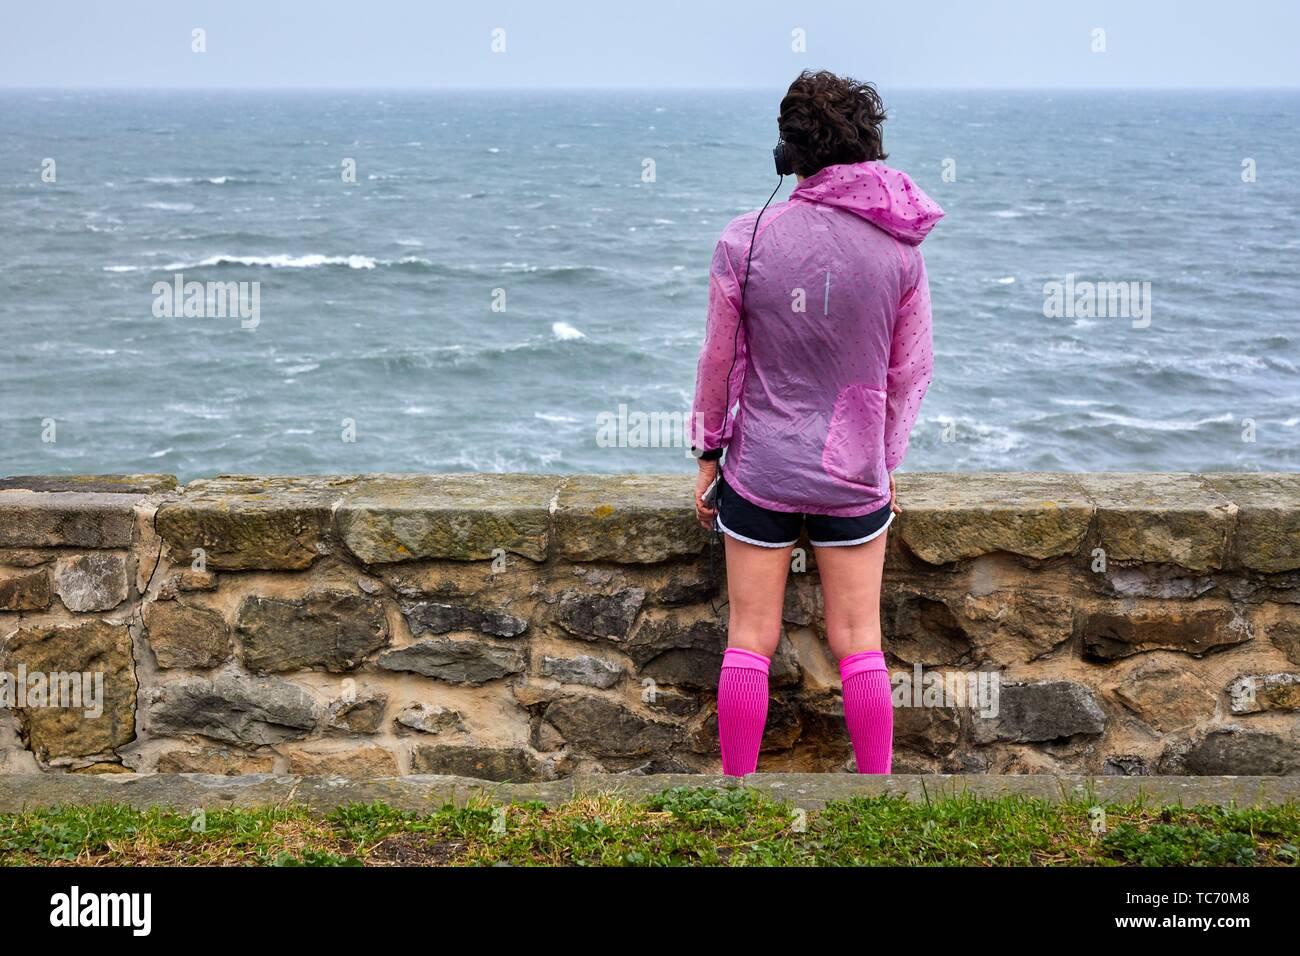 Woman doing sport looking at the sea, Paseo Nuevo, Donostia, San Sebastian, Gipuzkoa, Basque Country, Spain Stock Photo